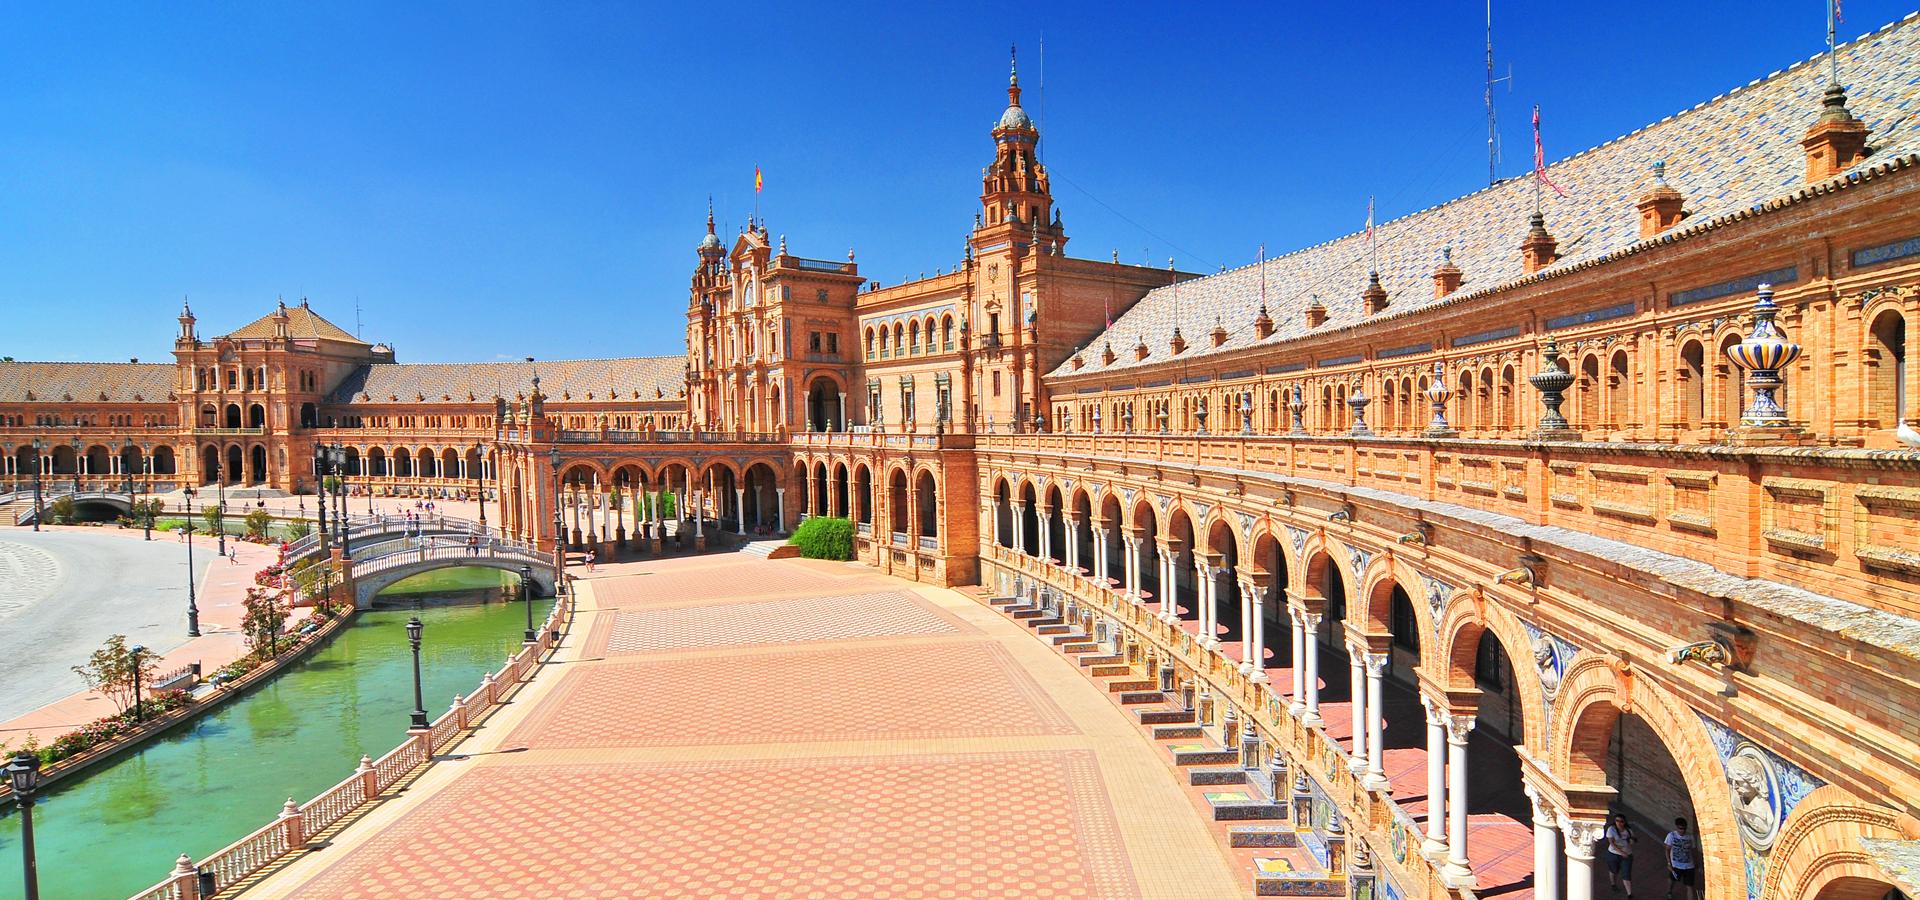 Peer-to-peer advisory in Algeciras, Andalusia, Spain